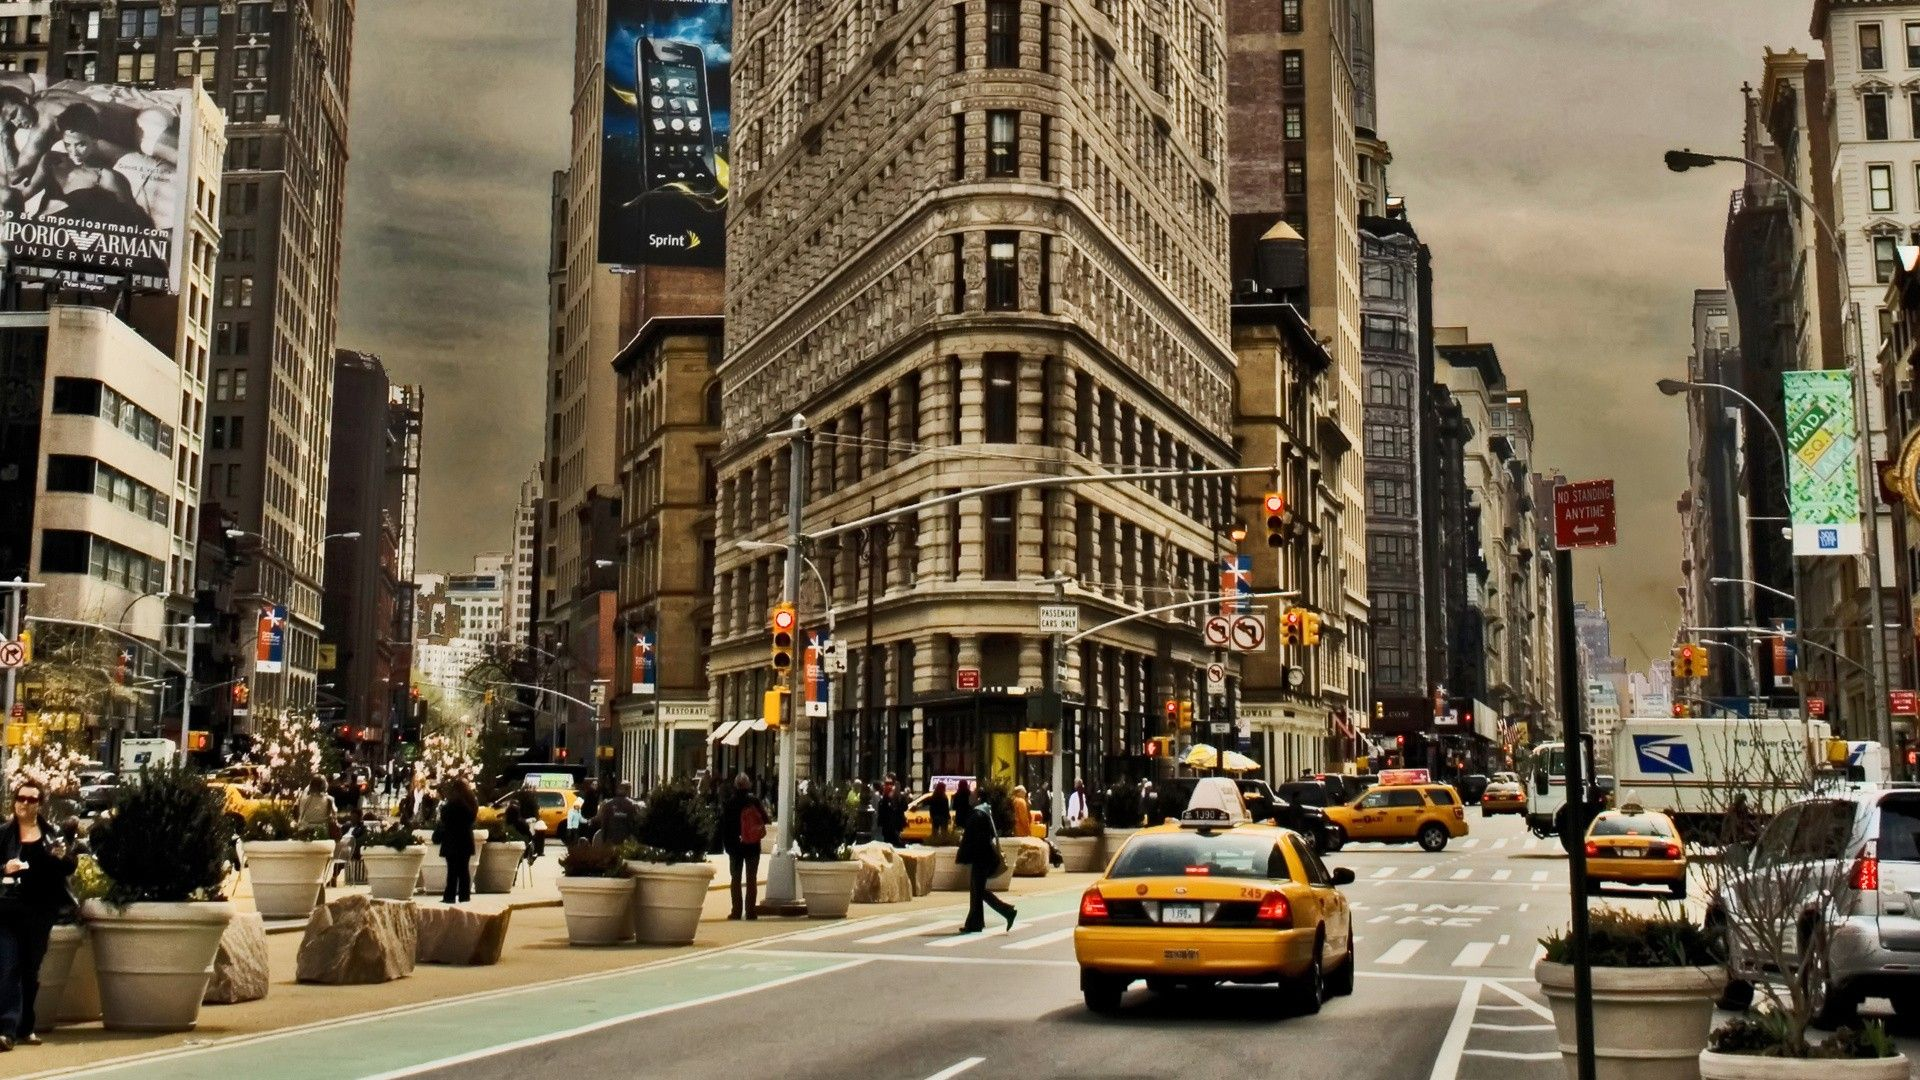 Flatiron New York Wallpaper New York City Photos New York City Buildings